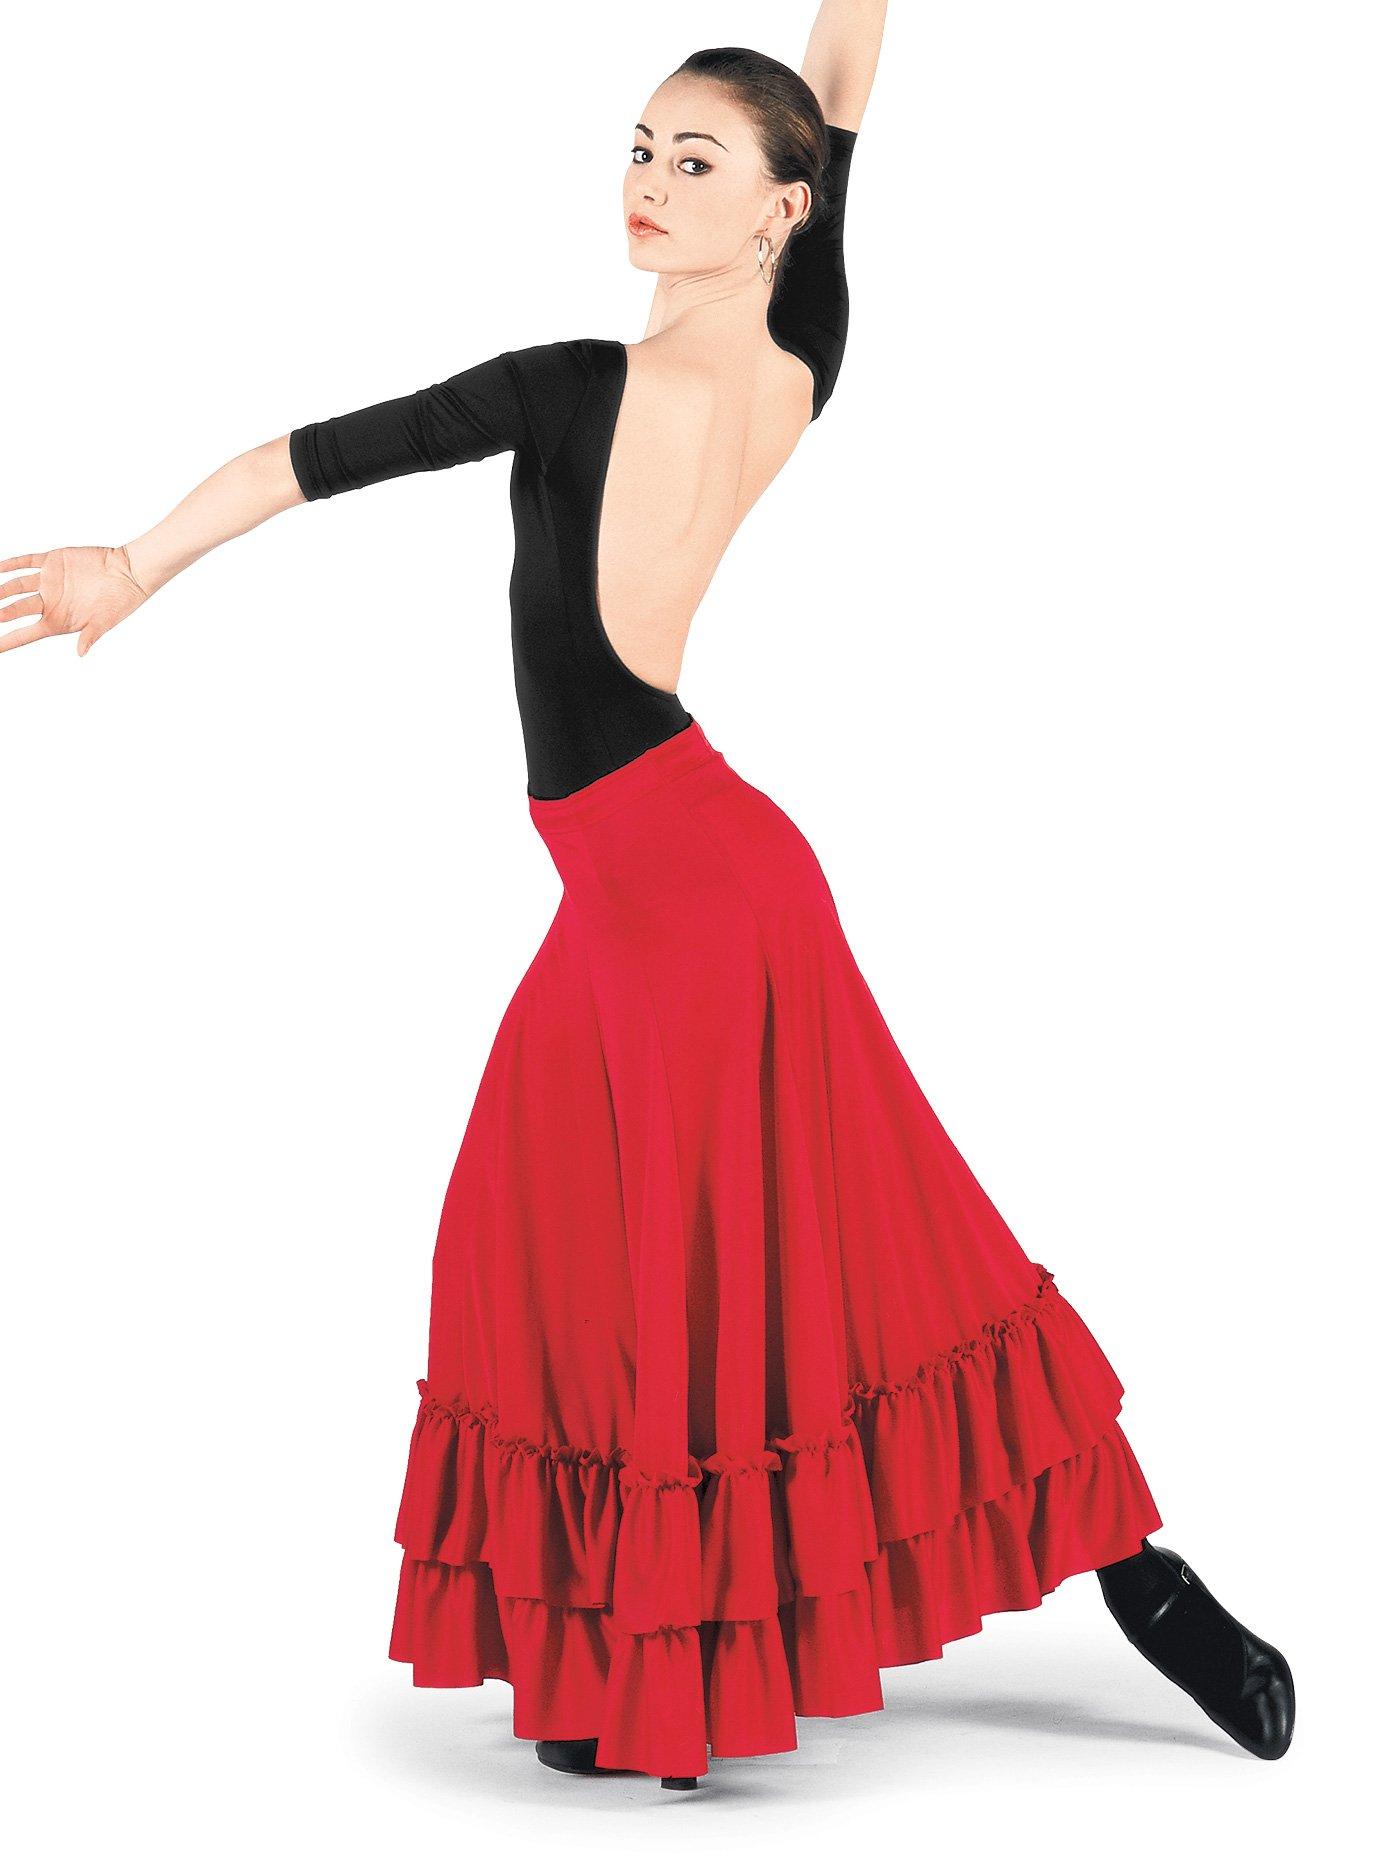 Adult Flamenco Skirt,9100REDM,Red,Medium by Bal Togs